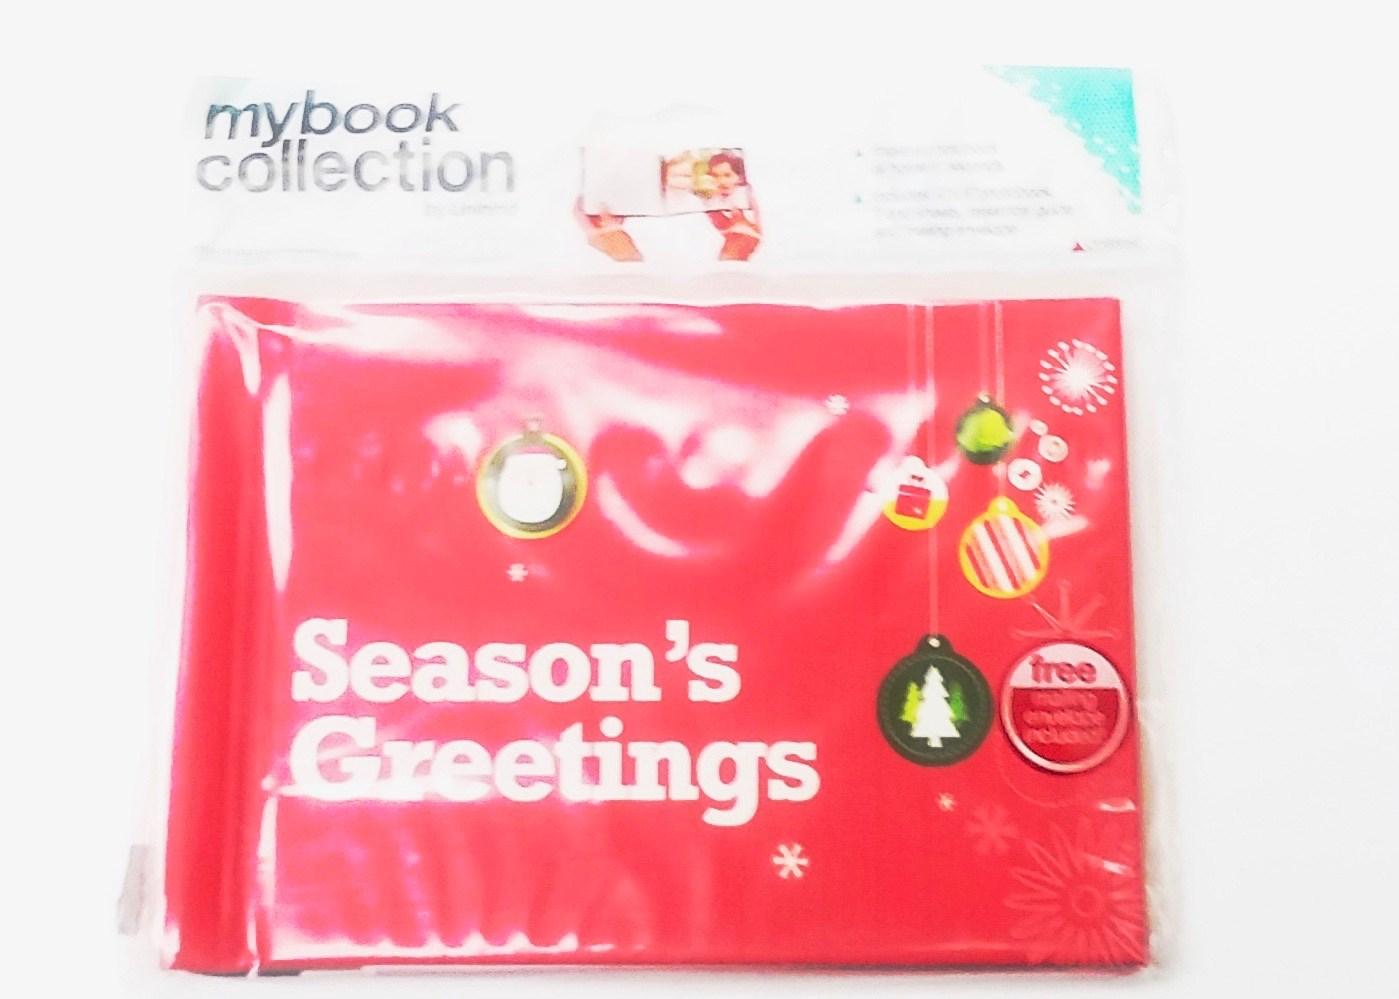 Photobook Mailer - Season's Greetings ornaments